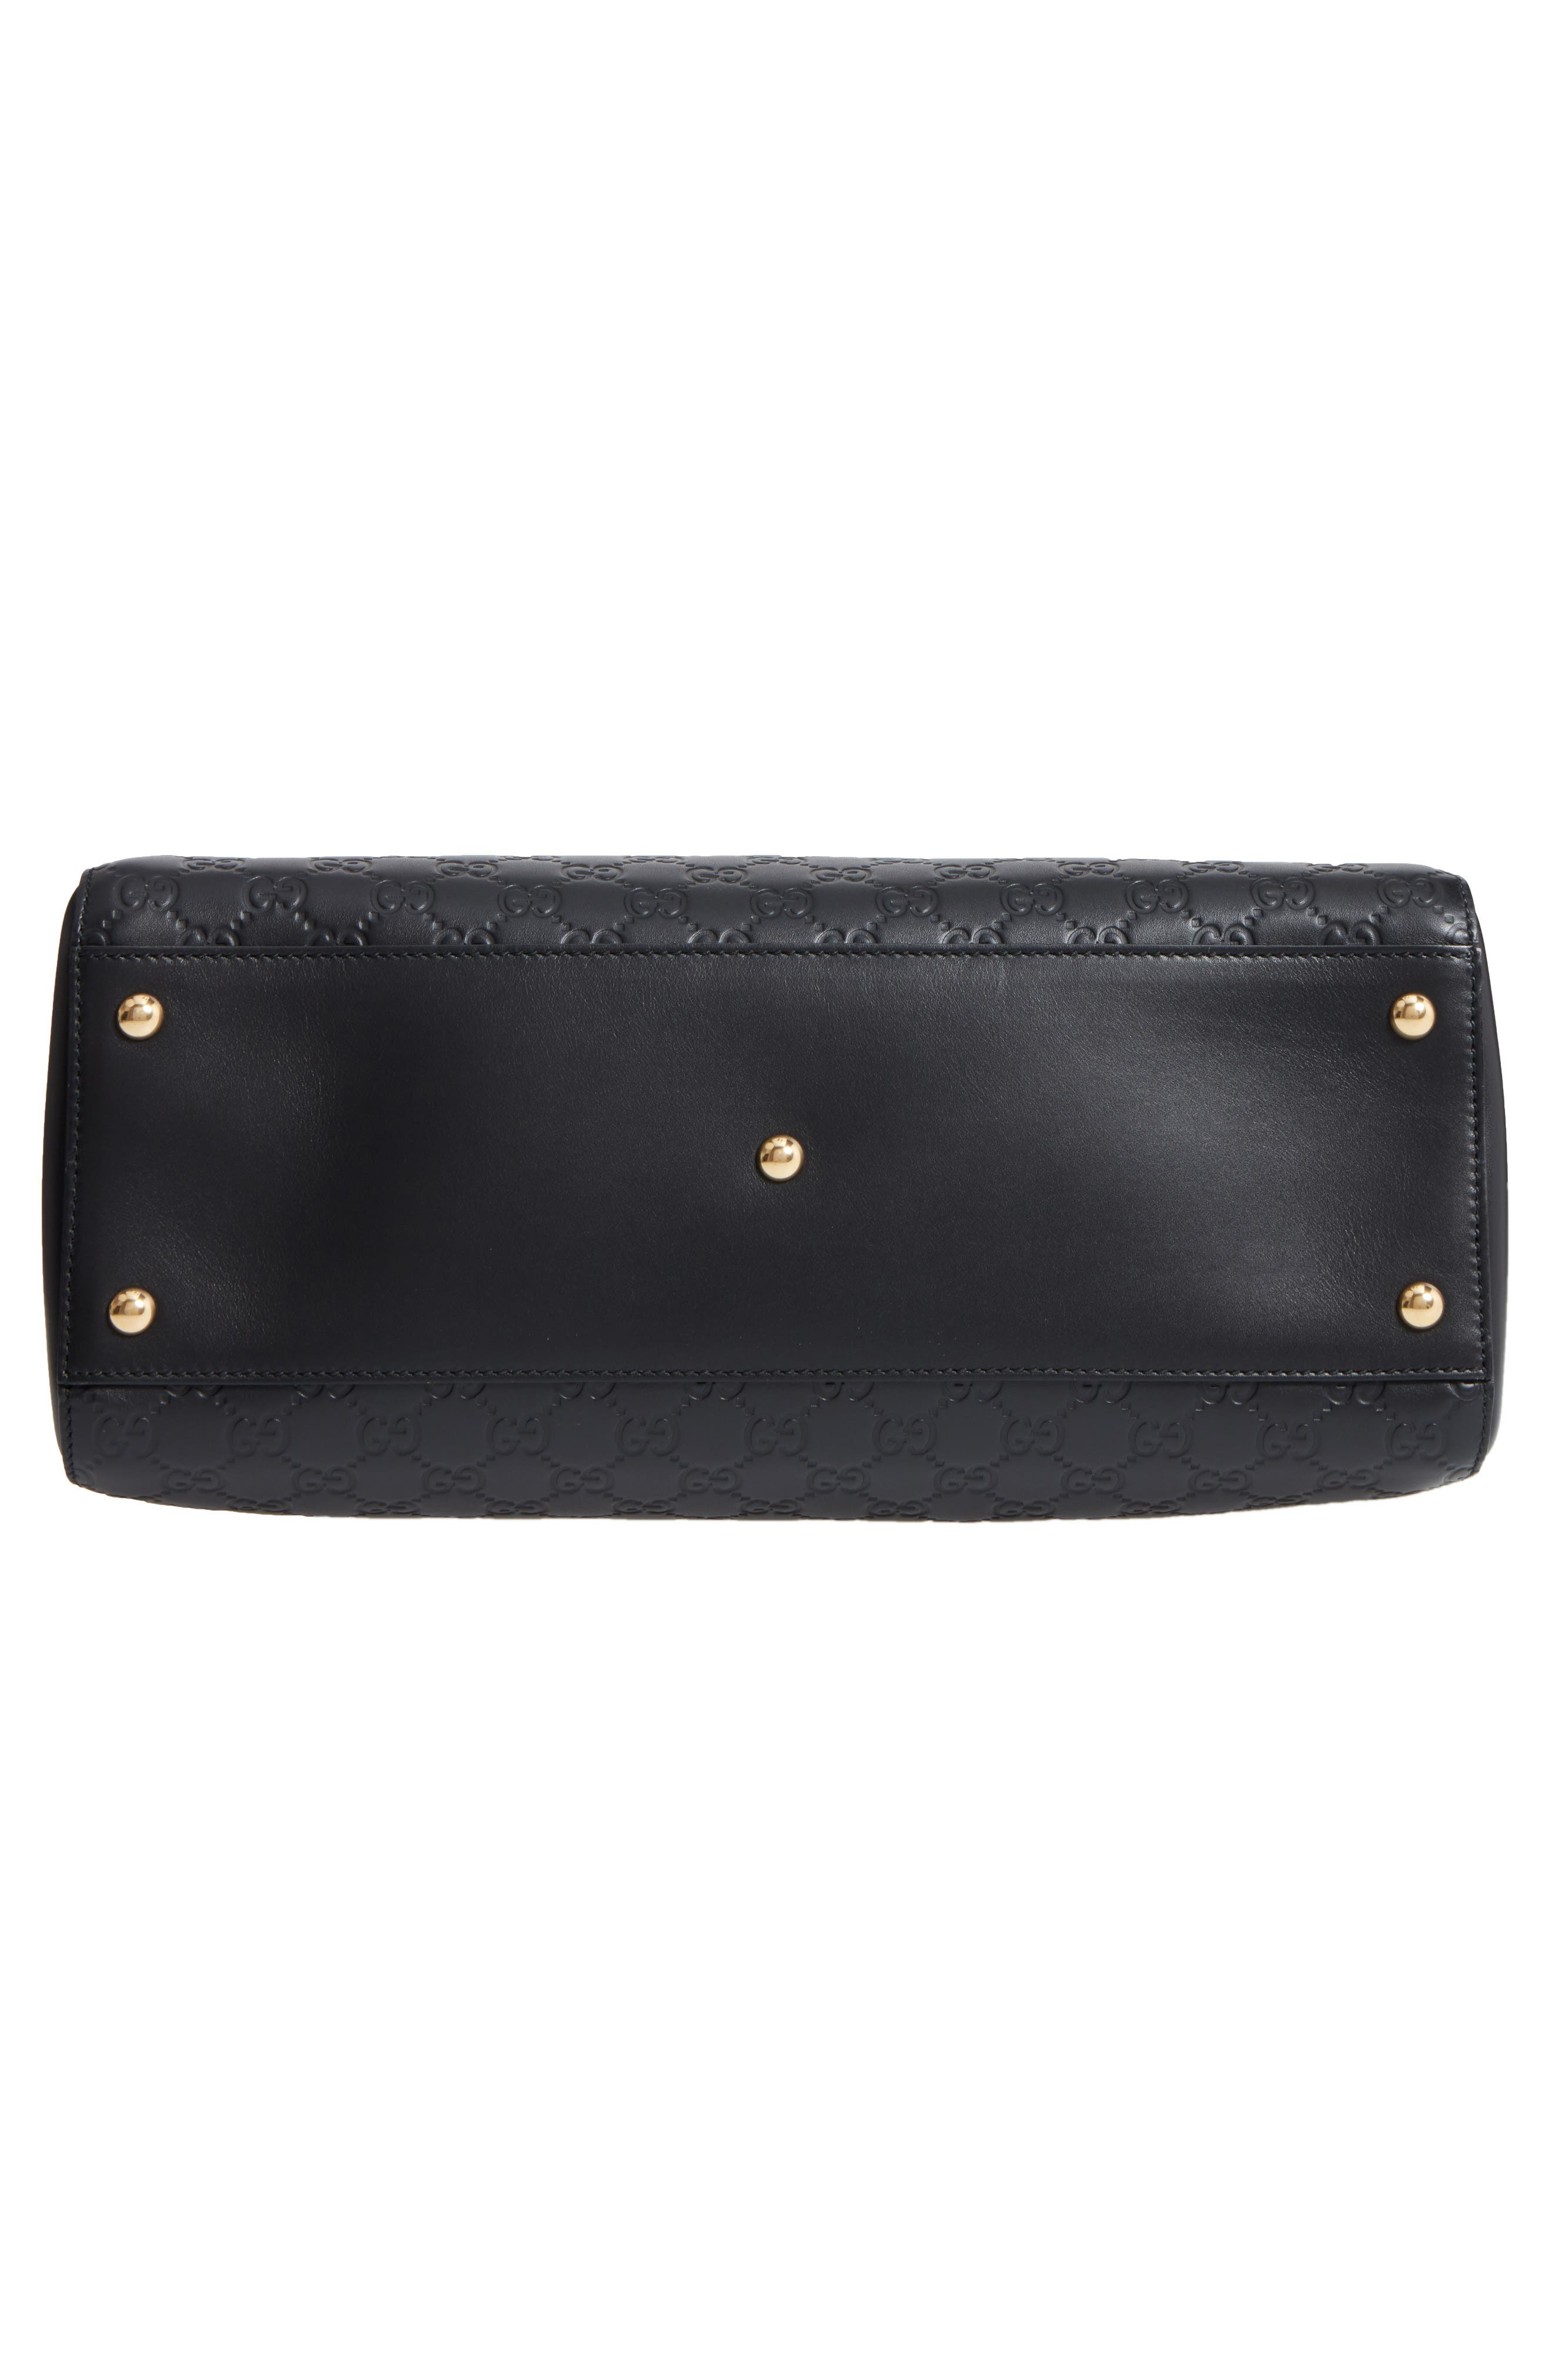 Large Signature Leather Shoulder Bag,                             Alternate thumbnail 6, color,                             001